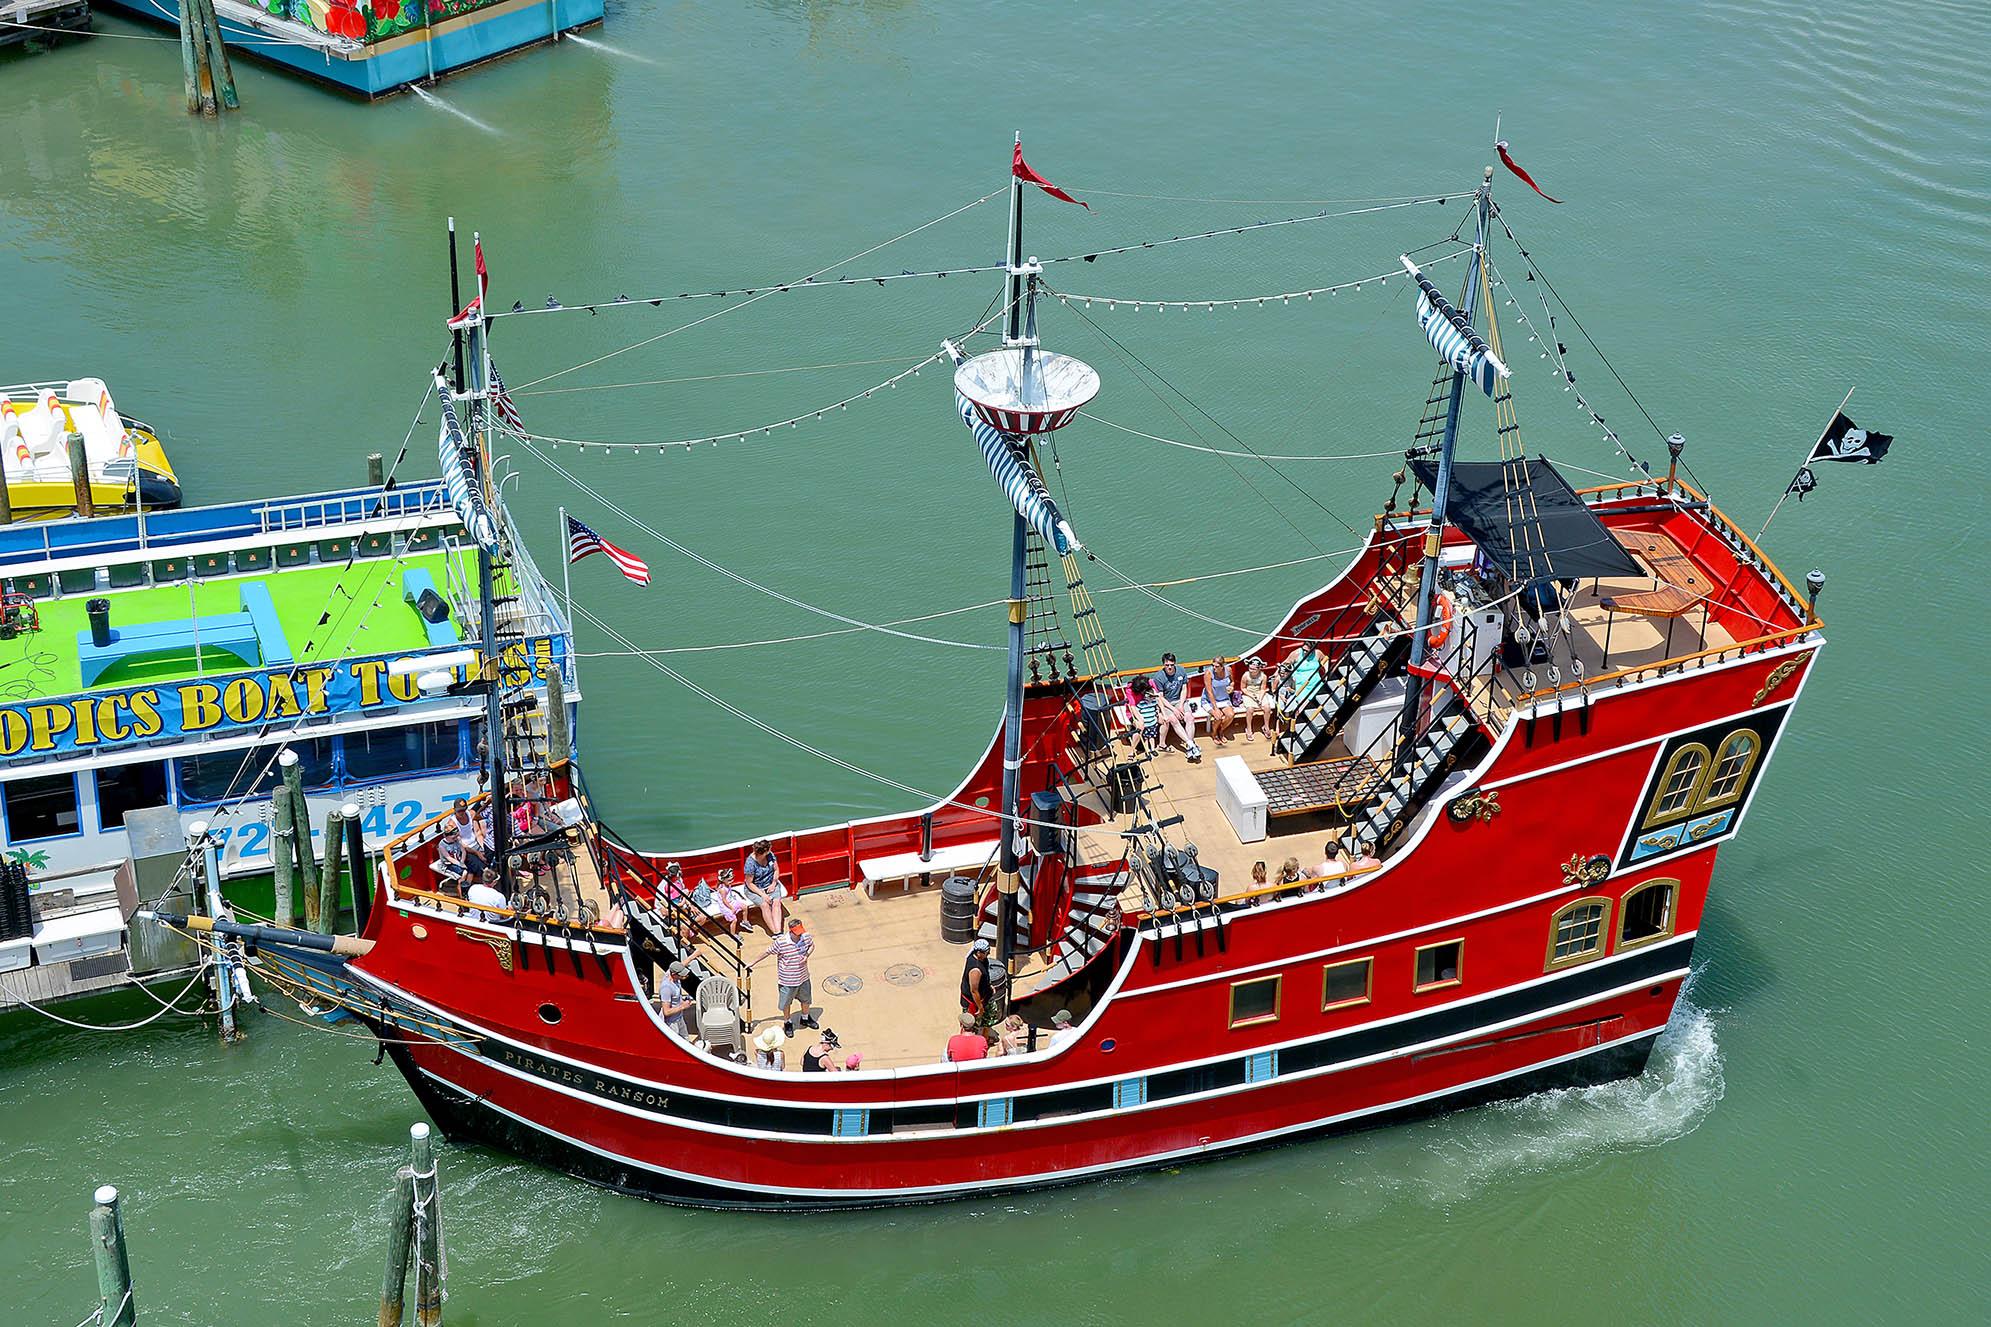 Clearwater Beach pirate boat